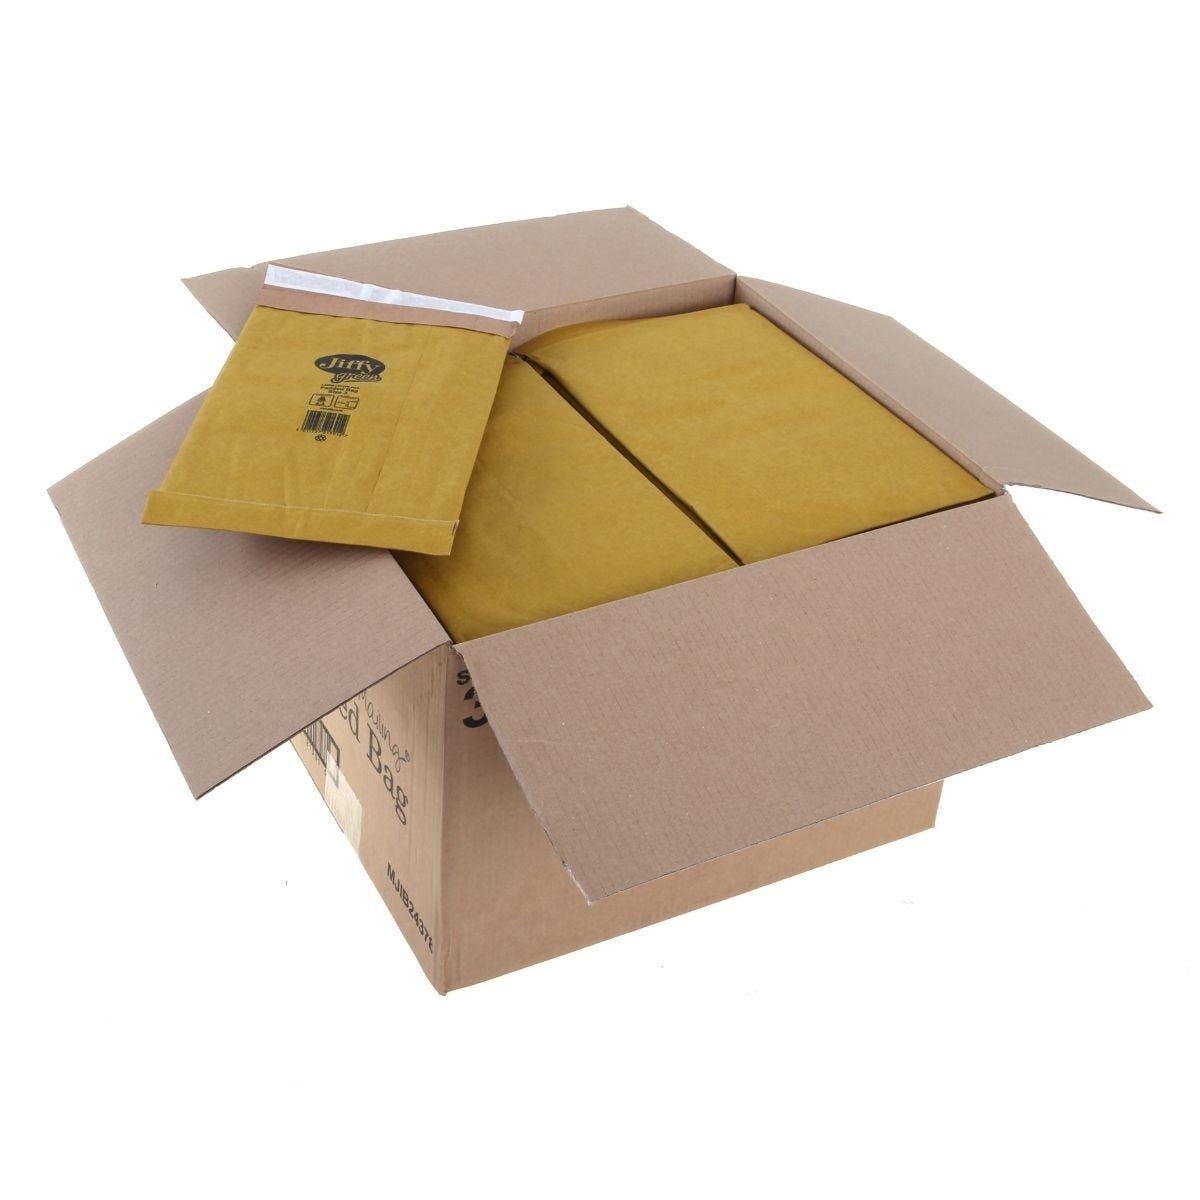 Jiffy Padded Bag Size 3 Box of 100